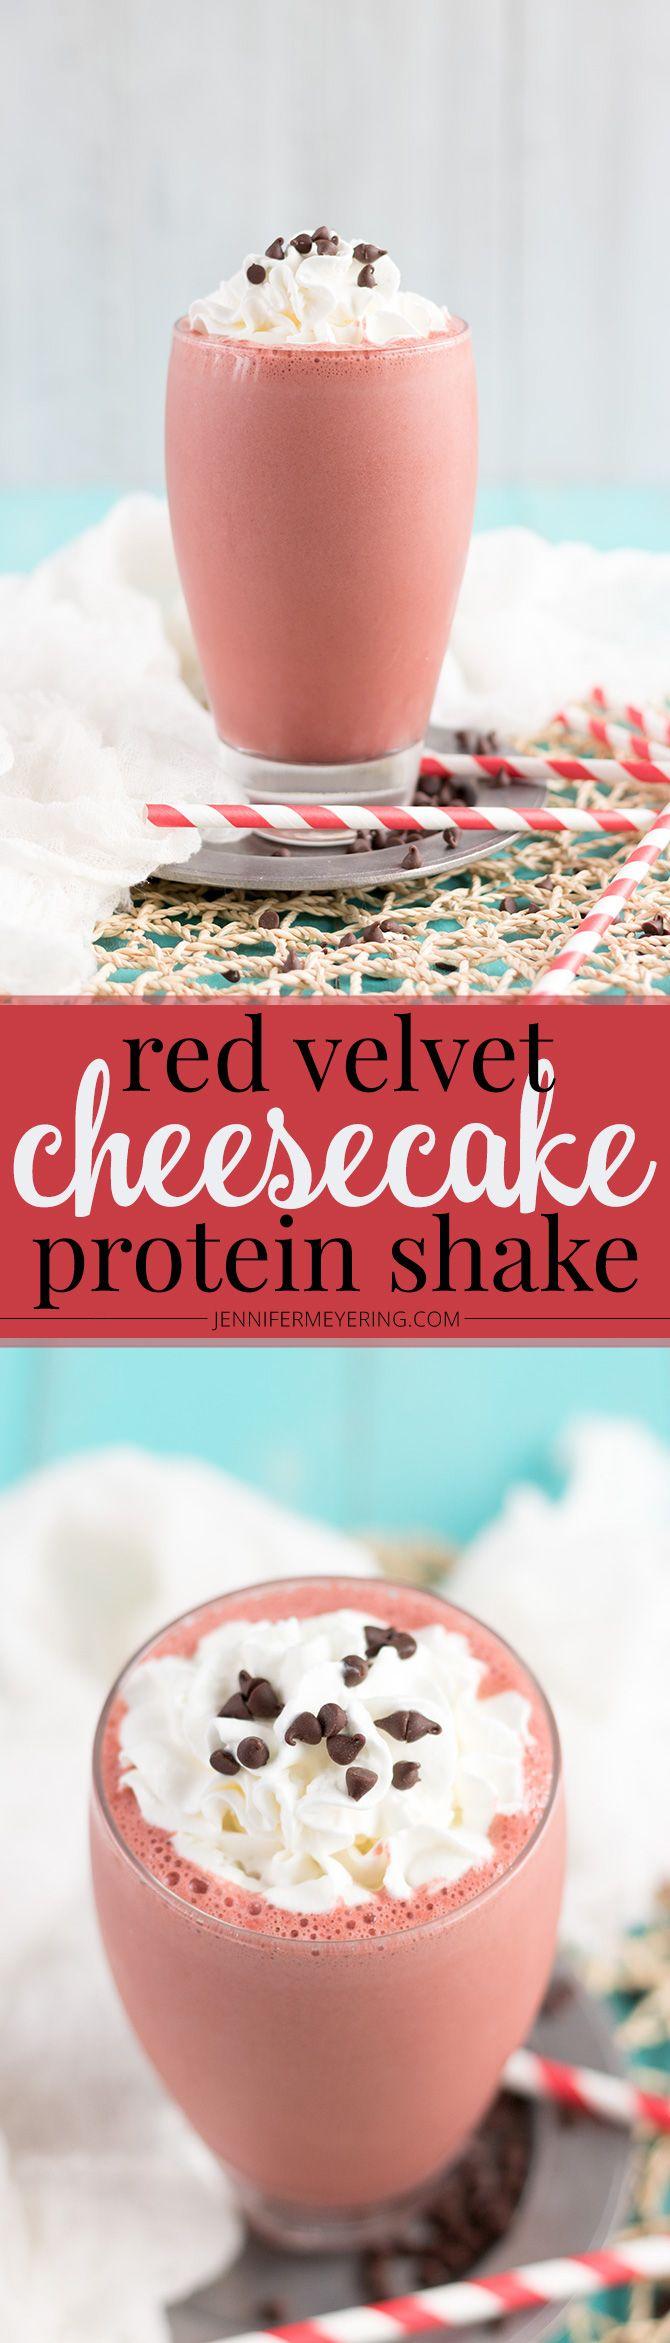 Red Velvet Cheesecake Protein Shake - Jennifer Meyering